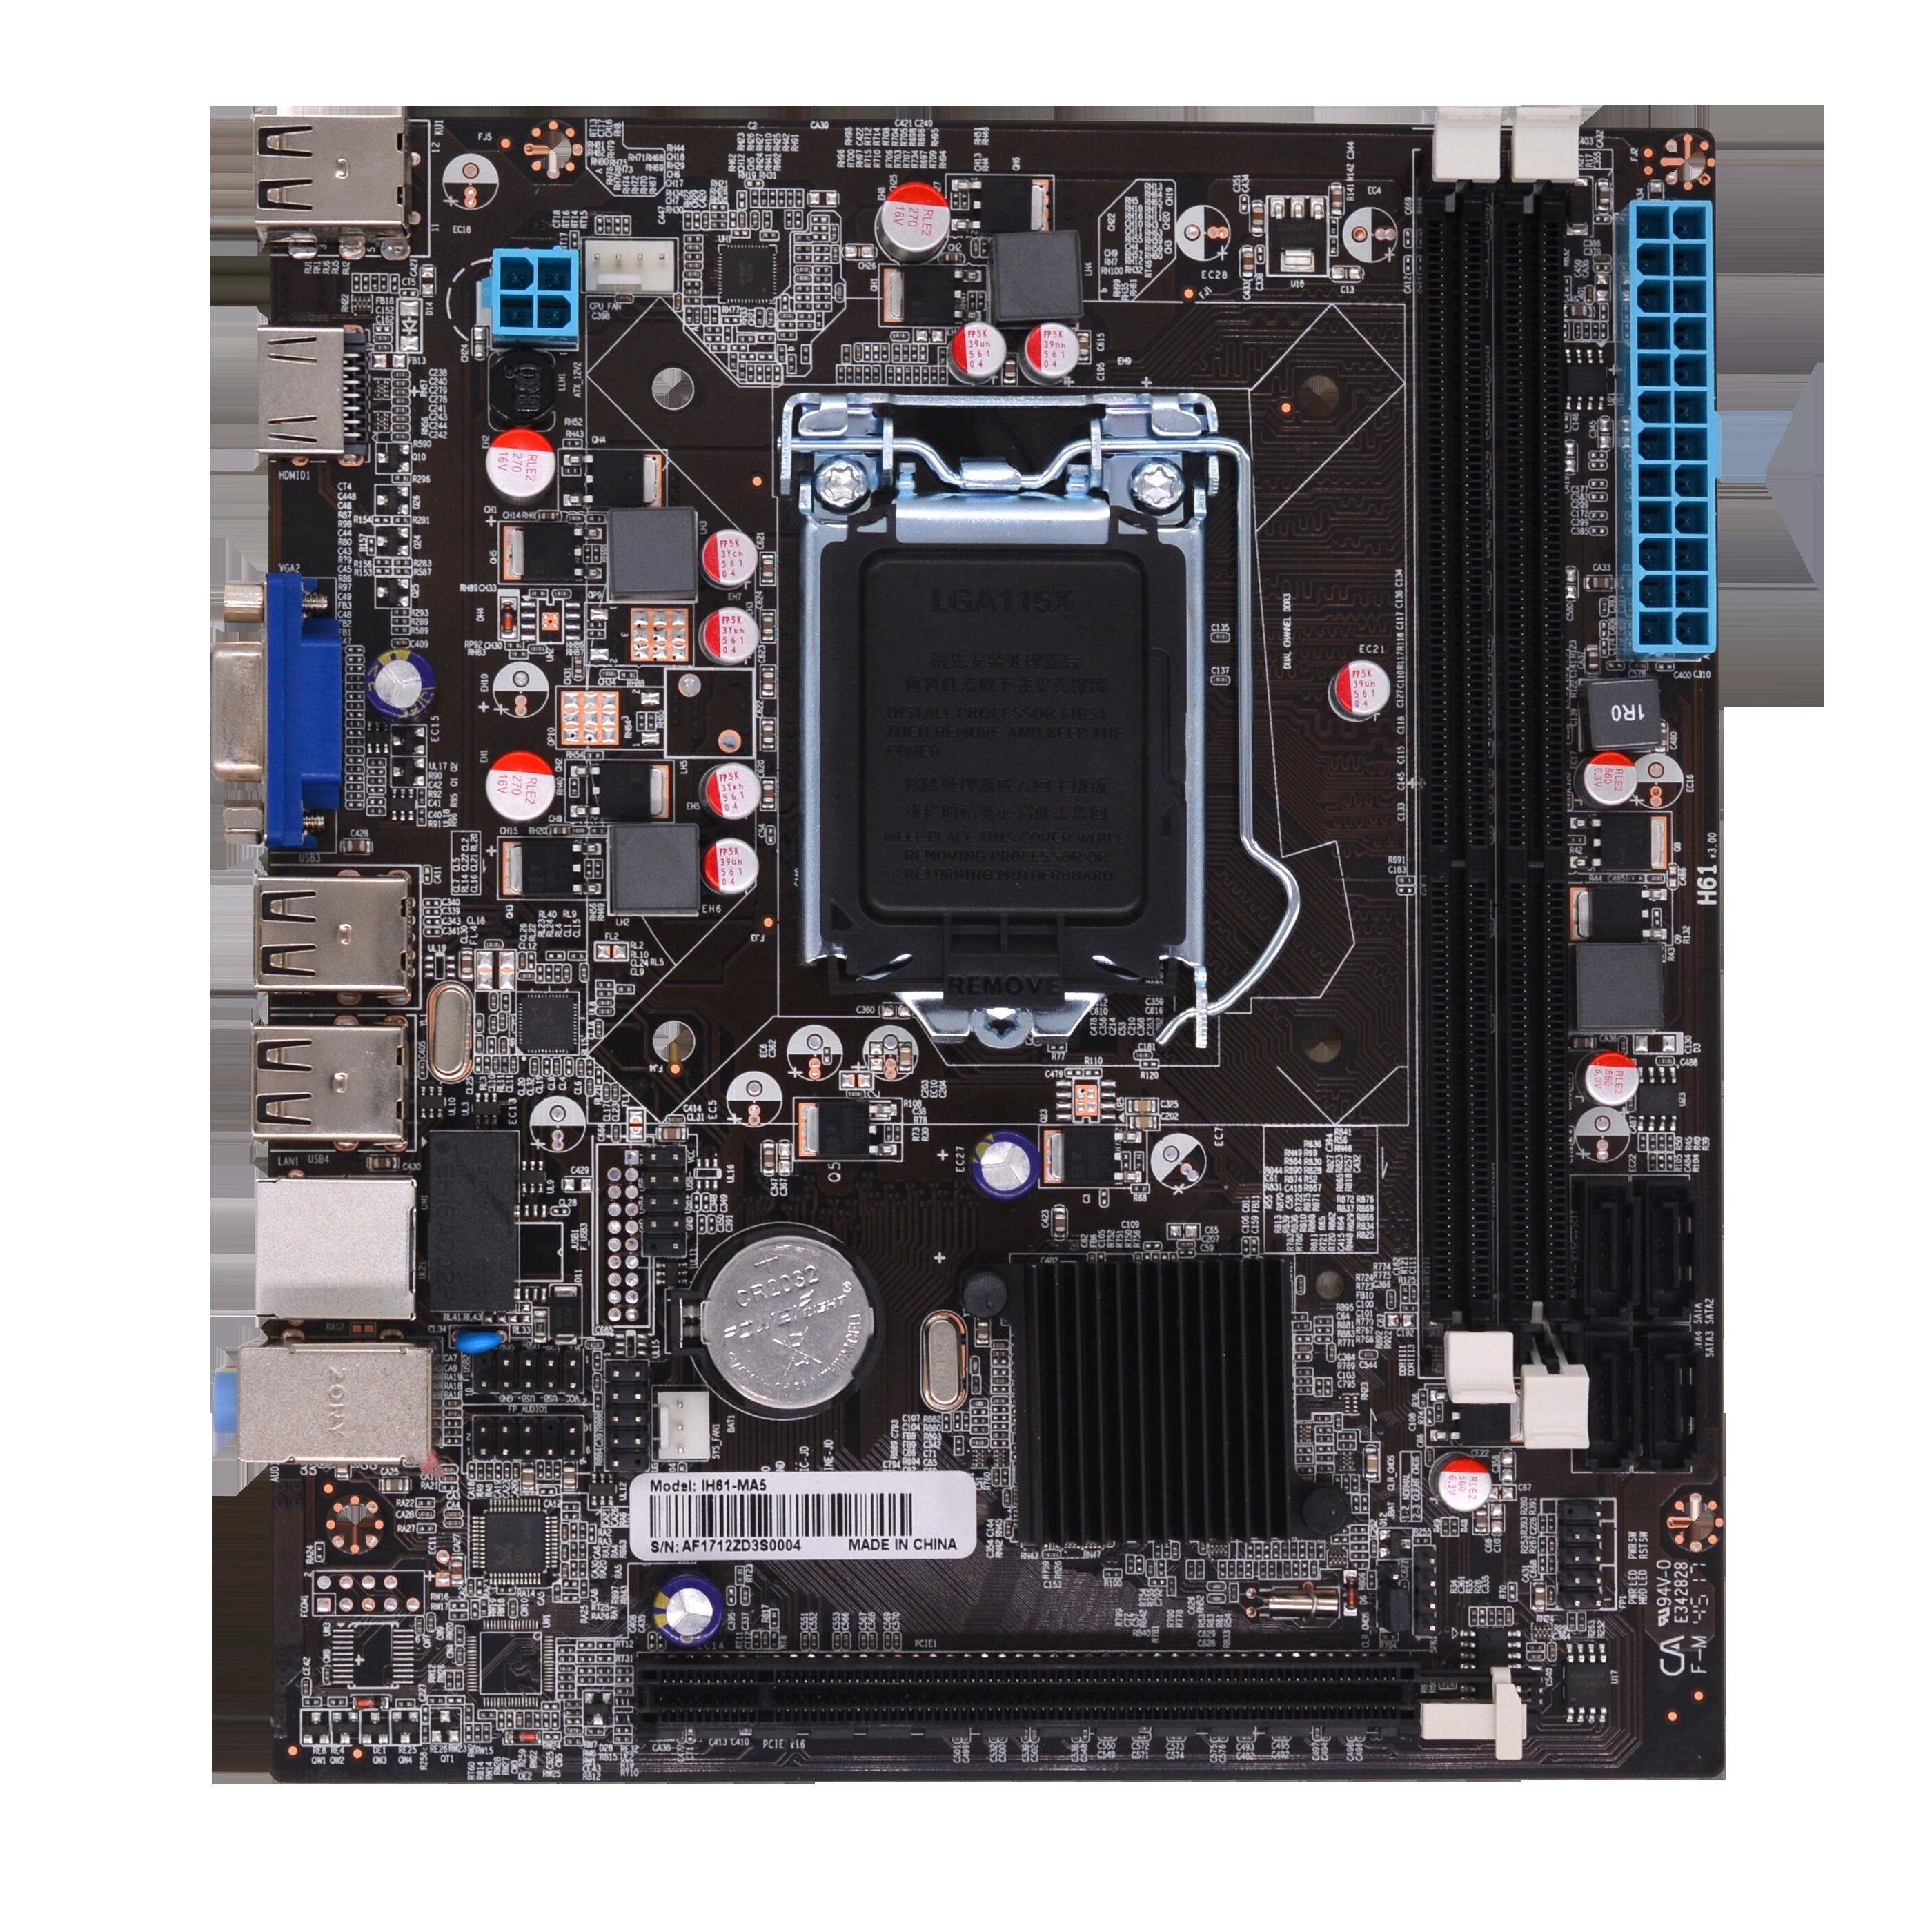 AFOX IH61-MA5 H61 DDR3 VGA USB 2.0 16X 1155 PIN ANAKART